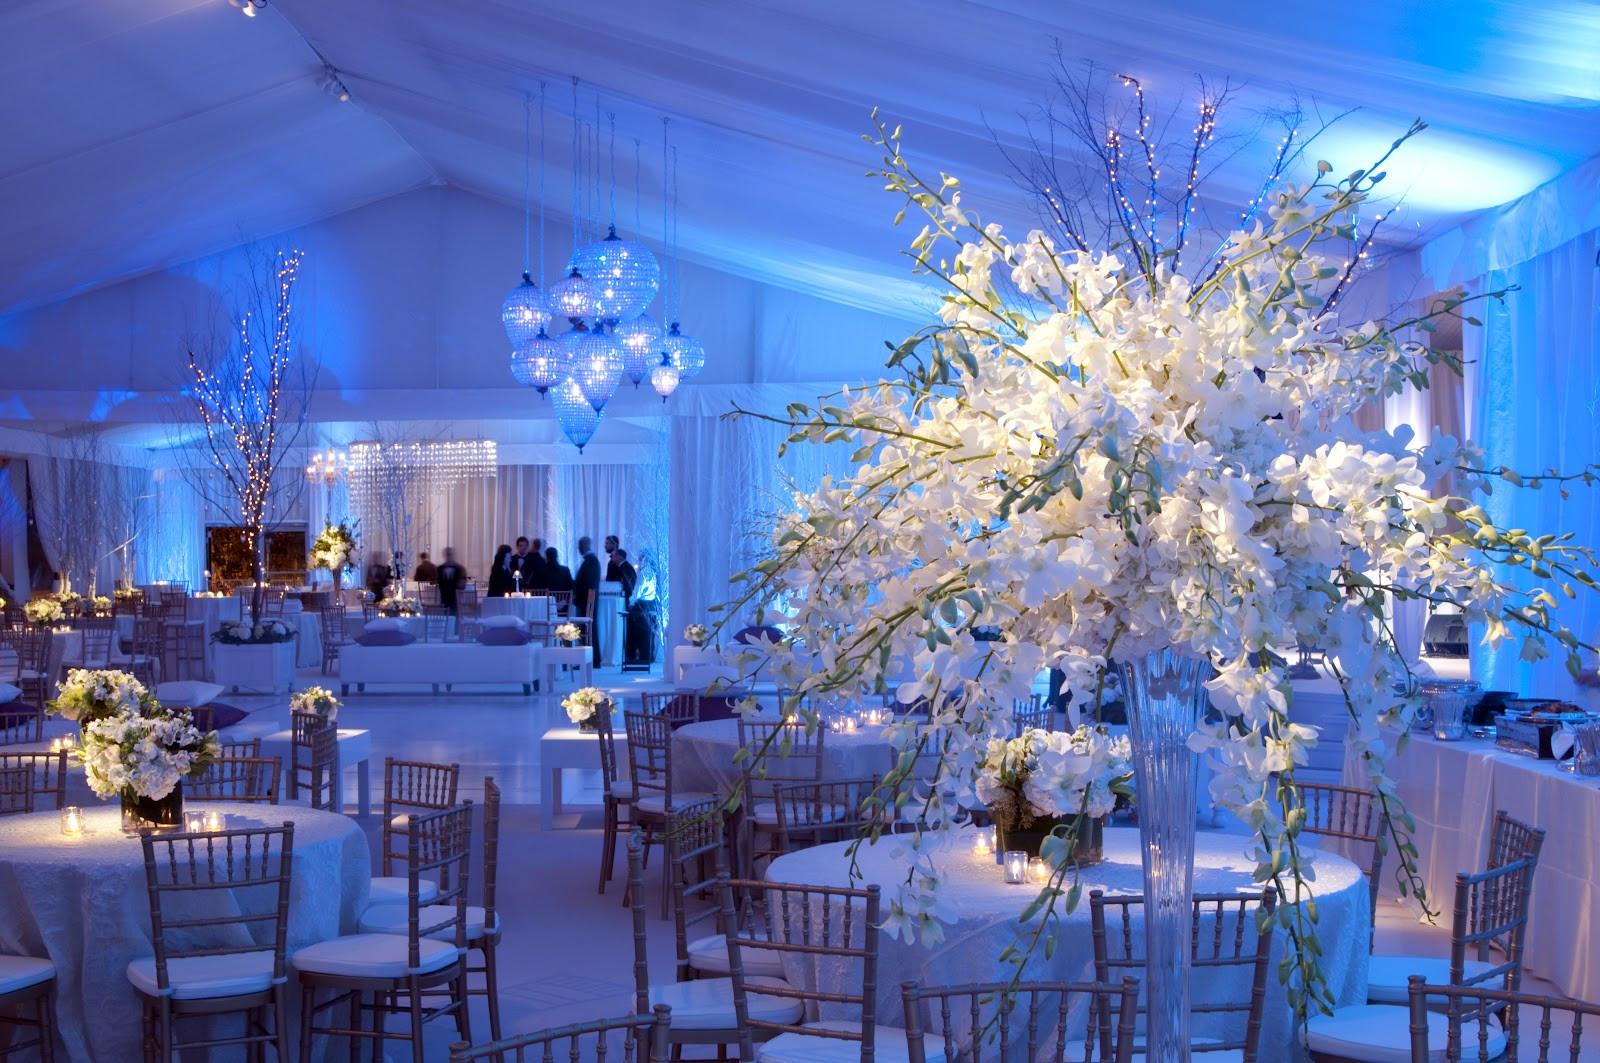 Winter Wedding Ideas Themes  Winter Wedding Theme